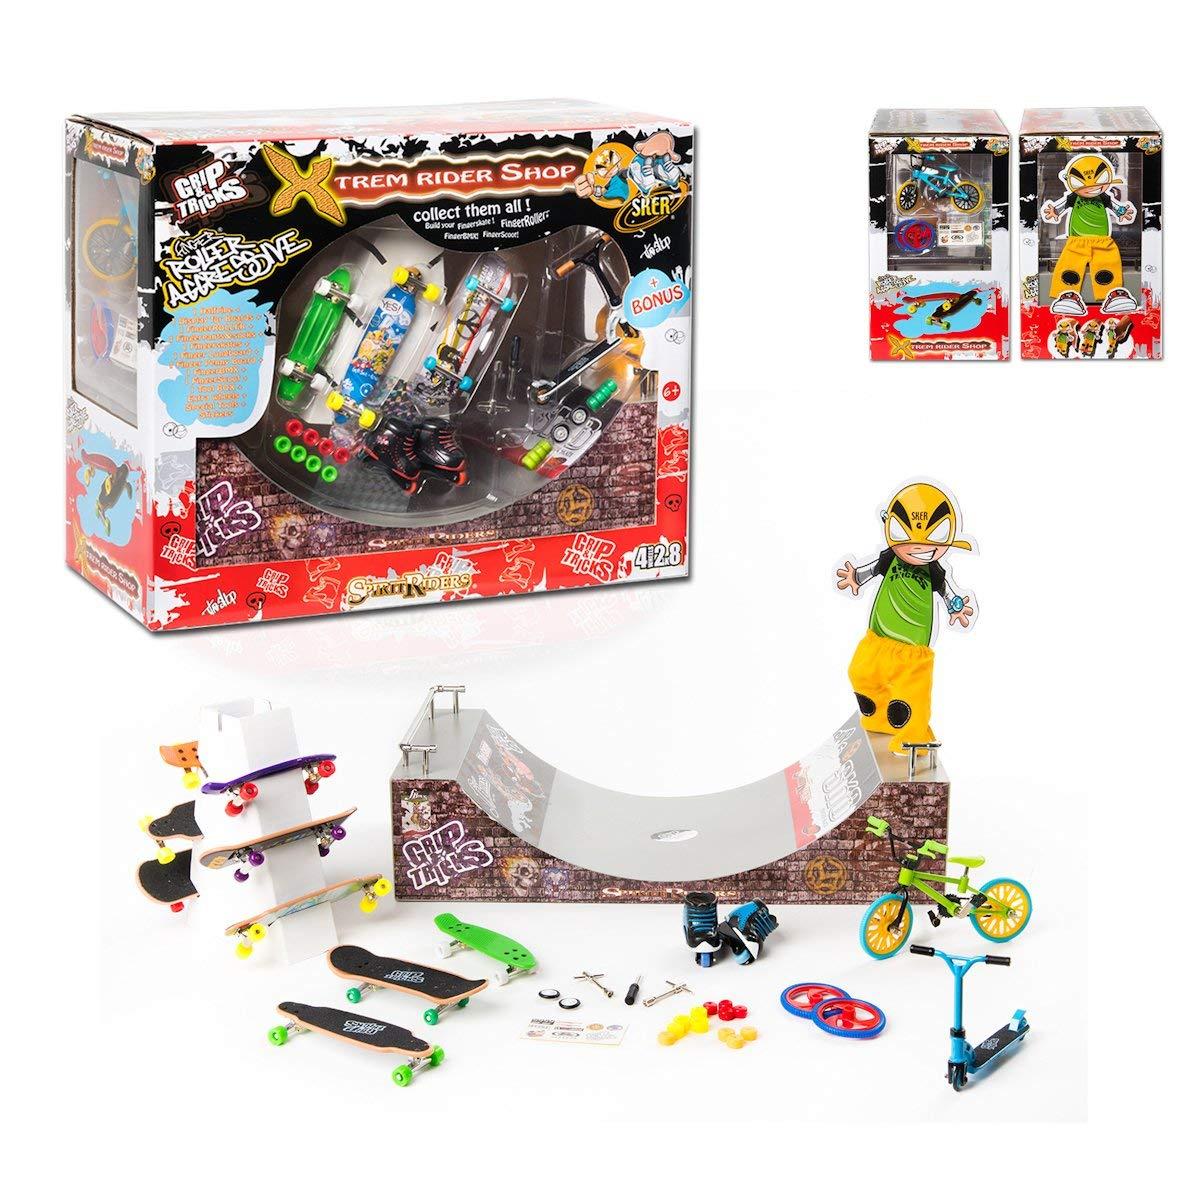 Grip & Tricks XTREM-13 Xtrem Shop Gift Box, Multicolored